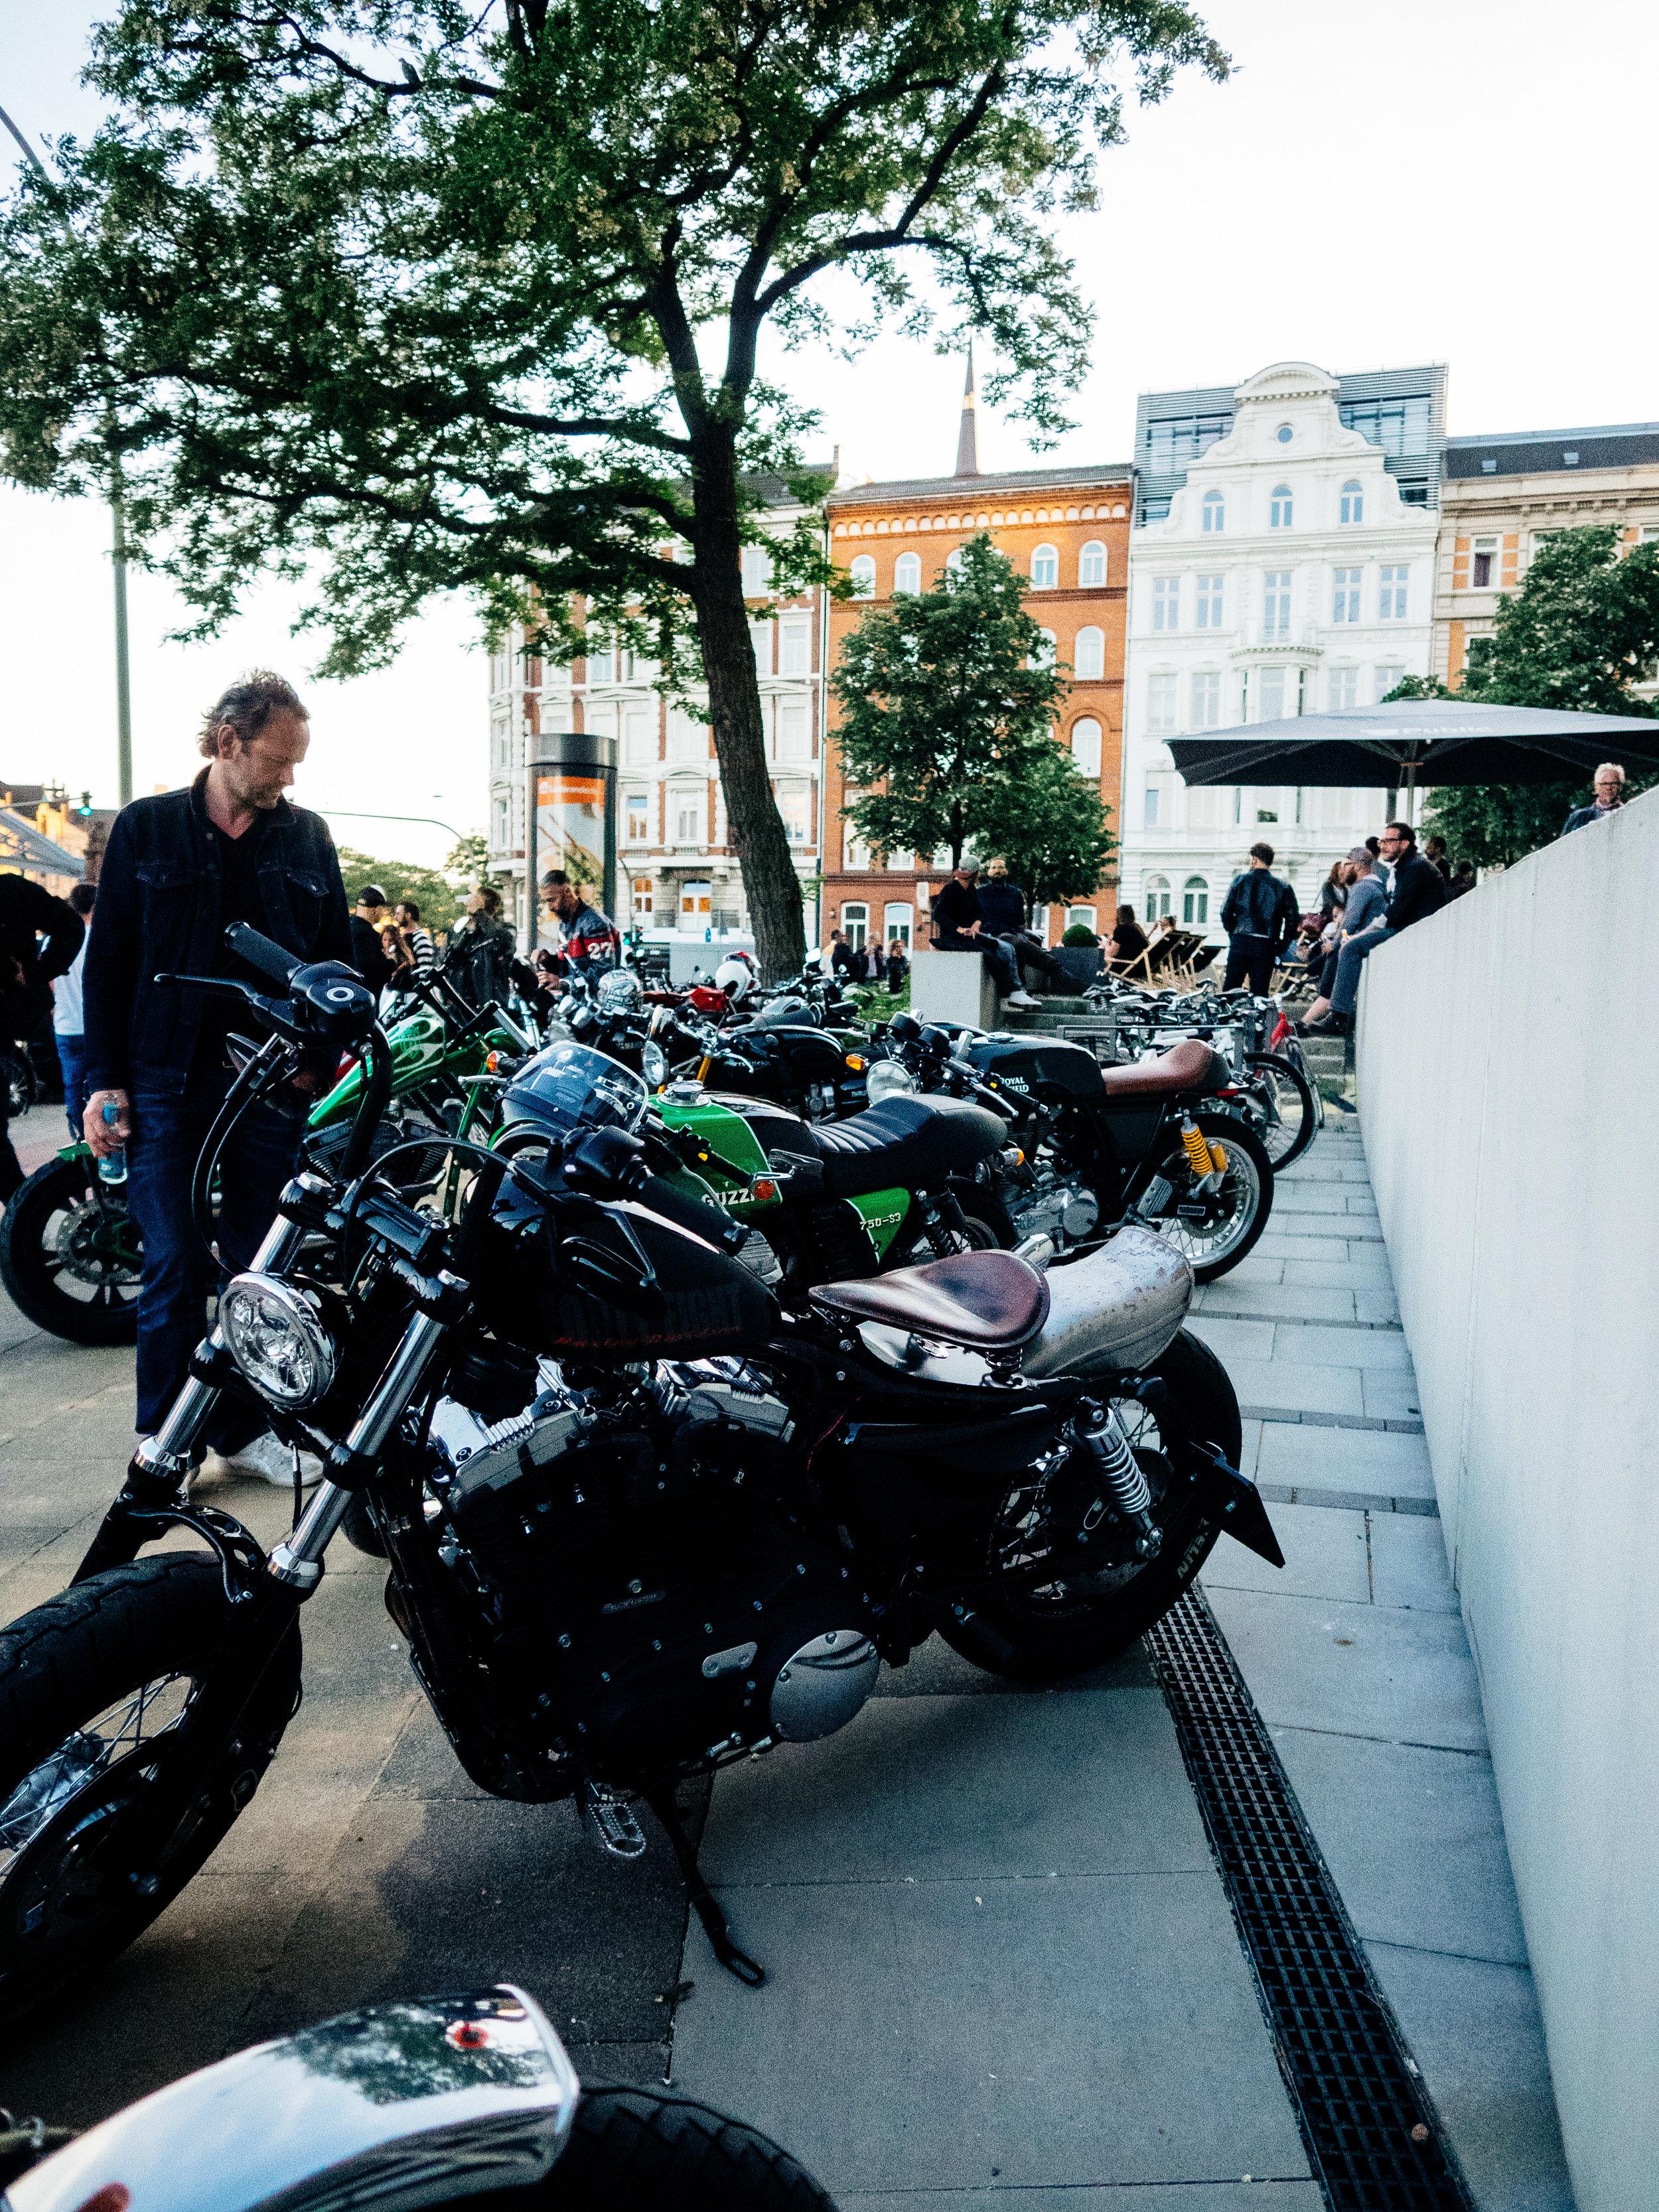 180524_themotosocial_Hamburg-108.jpg